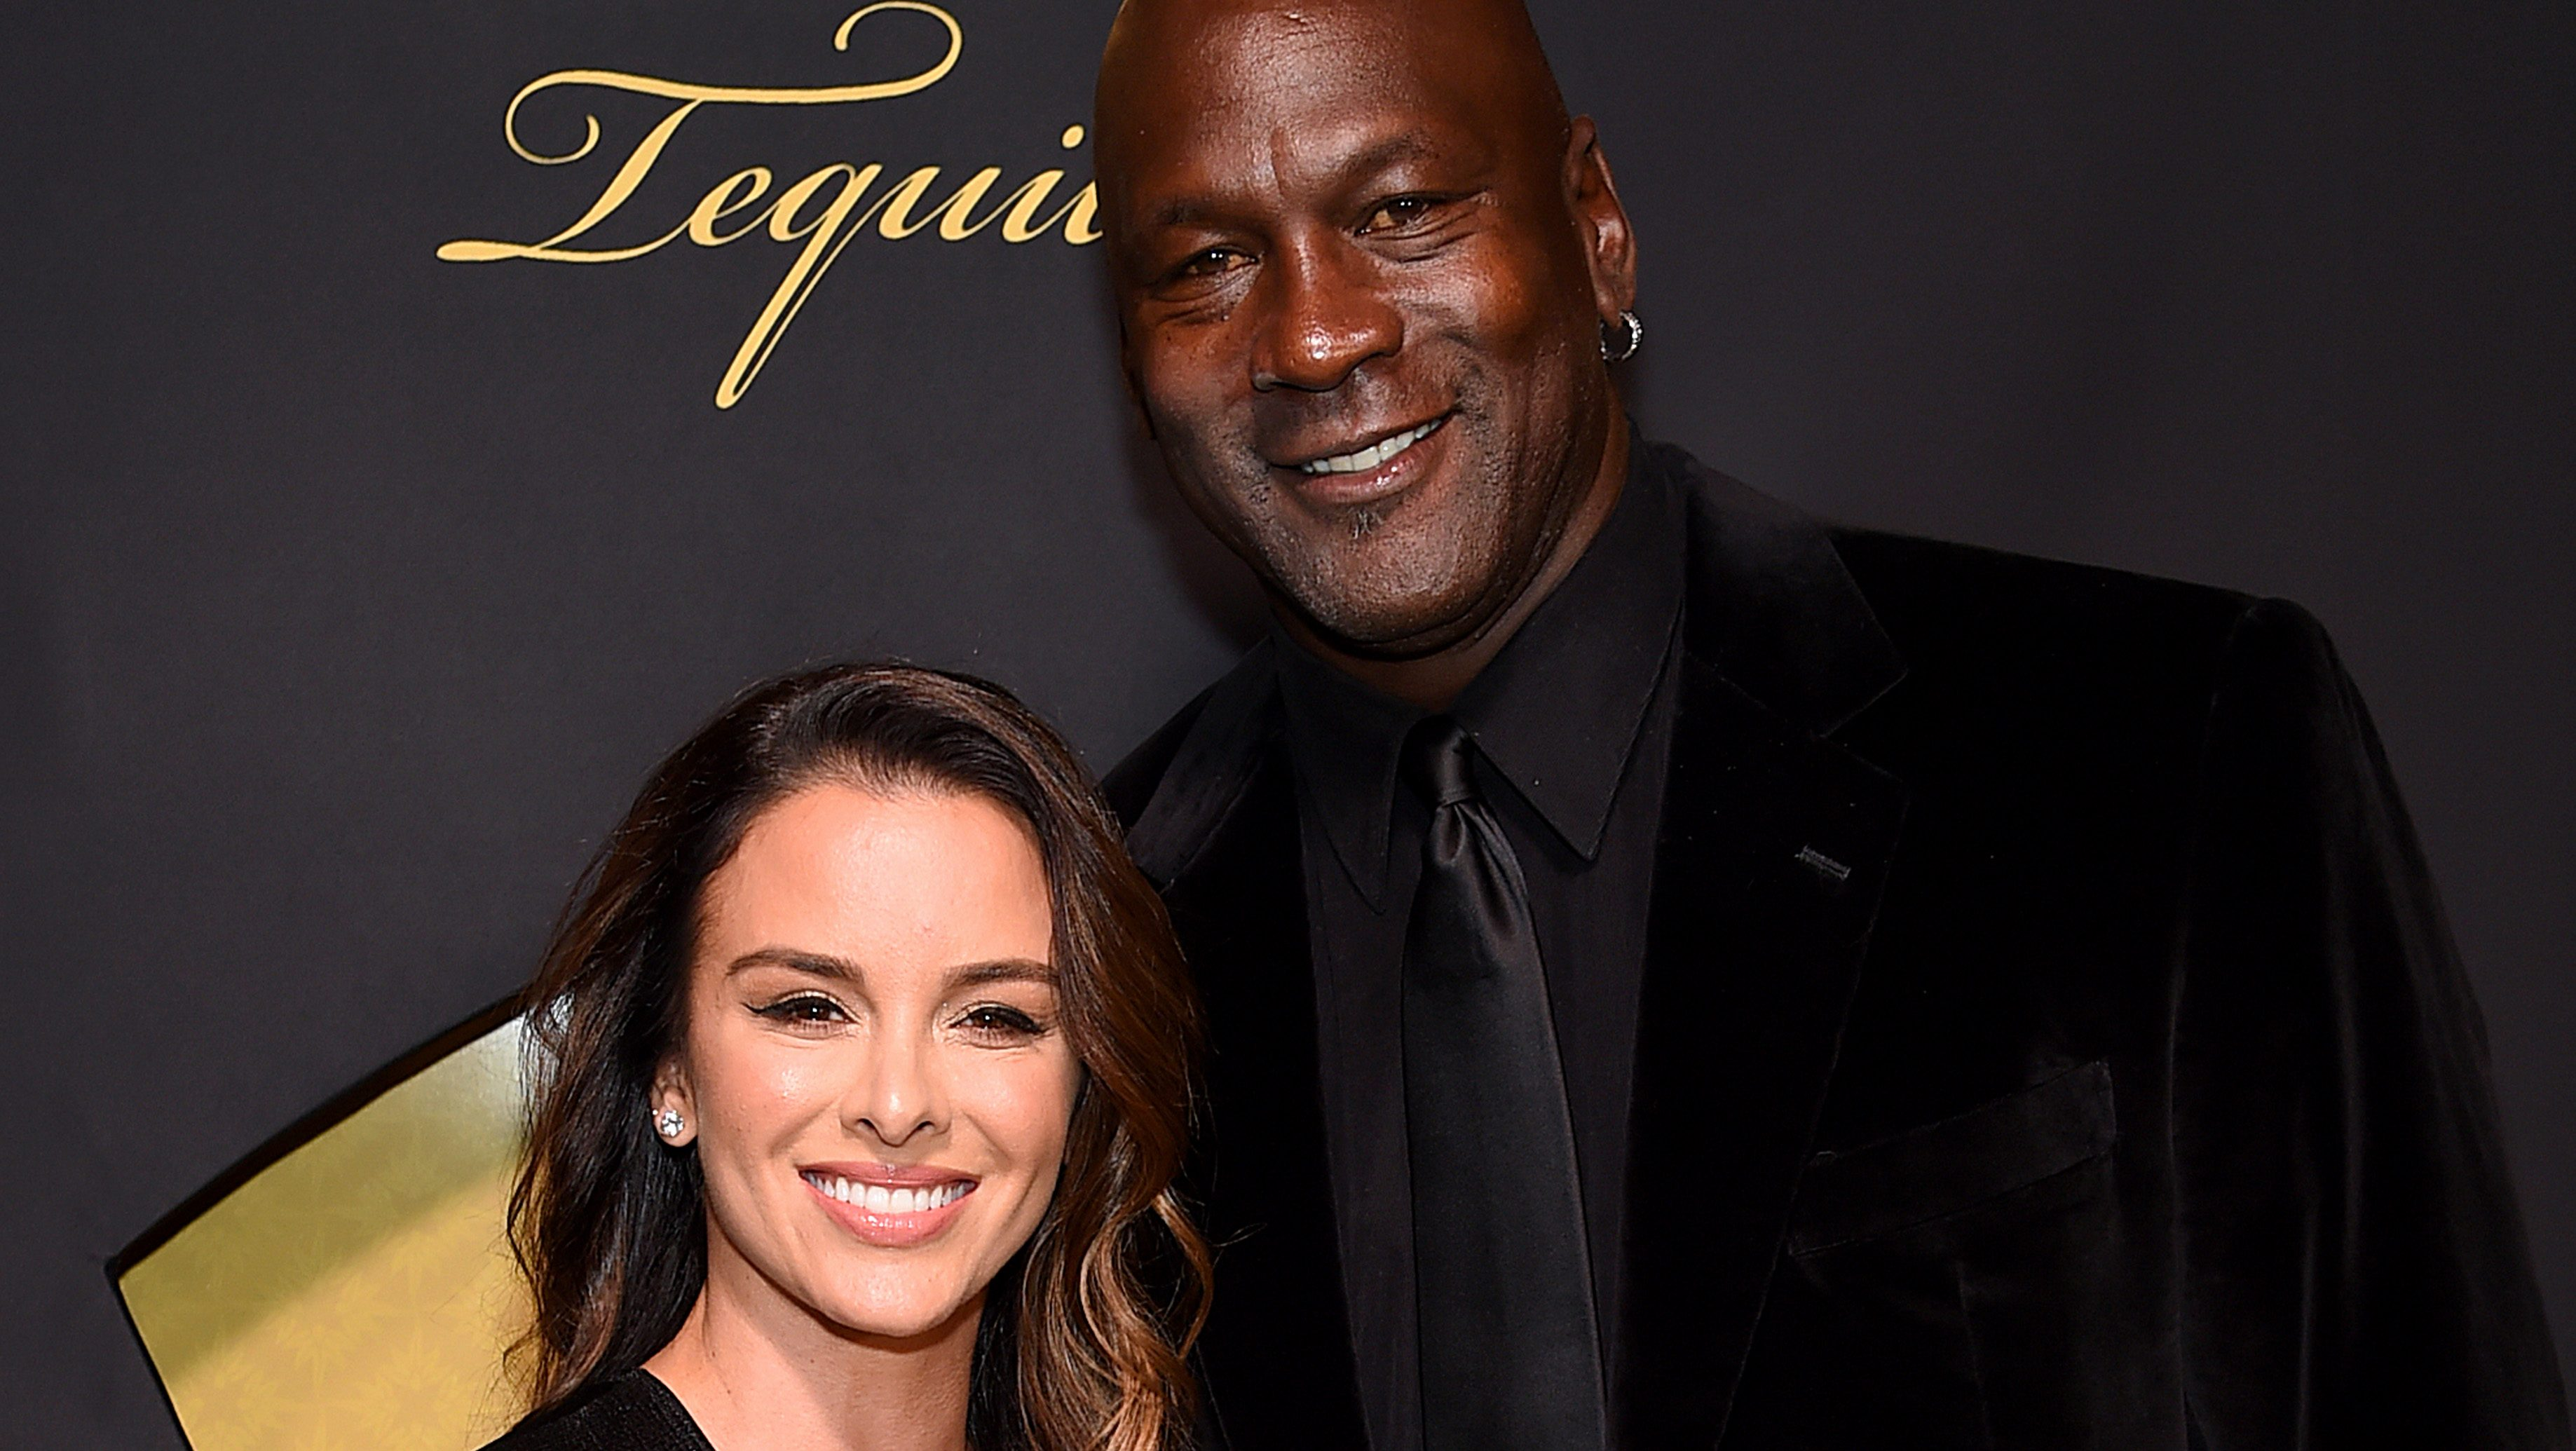 Michael Jordans Wife Yvette Prieto Is Proud Mom to Twins